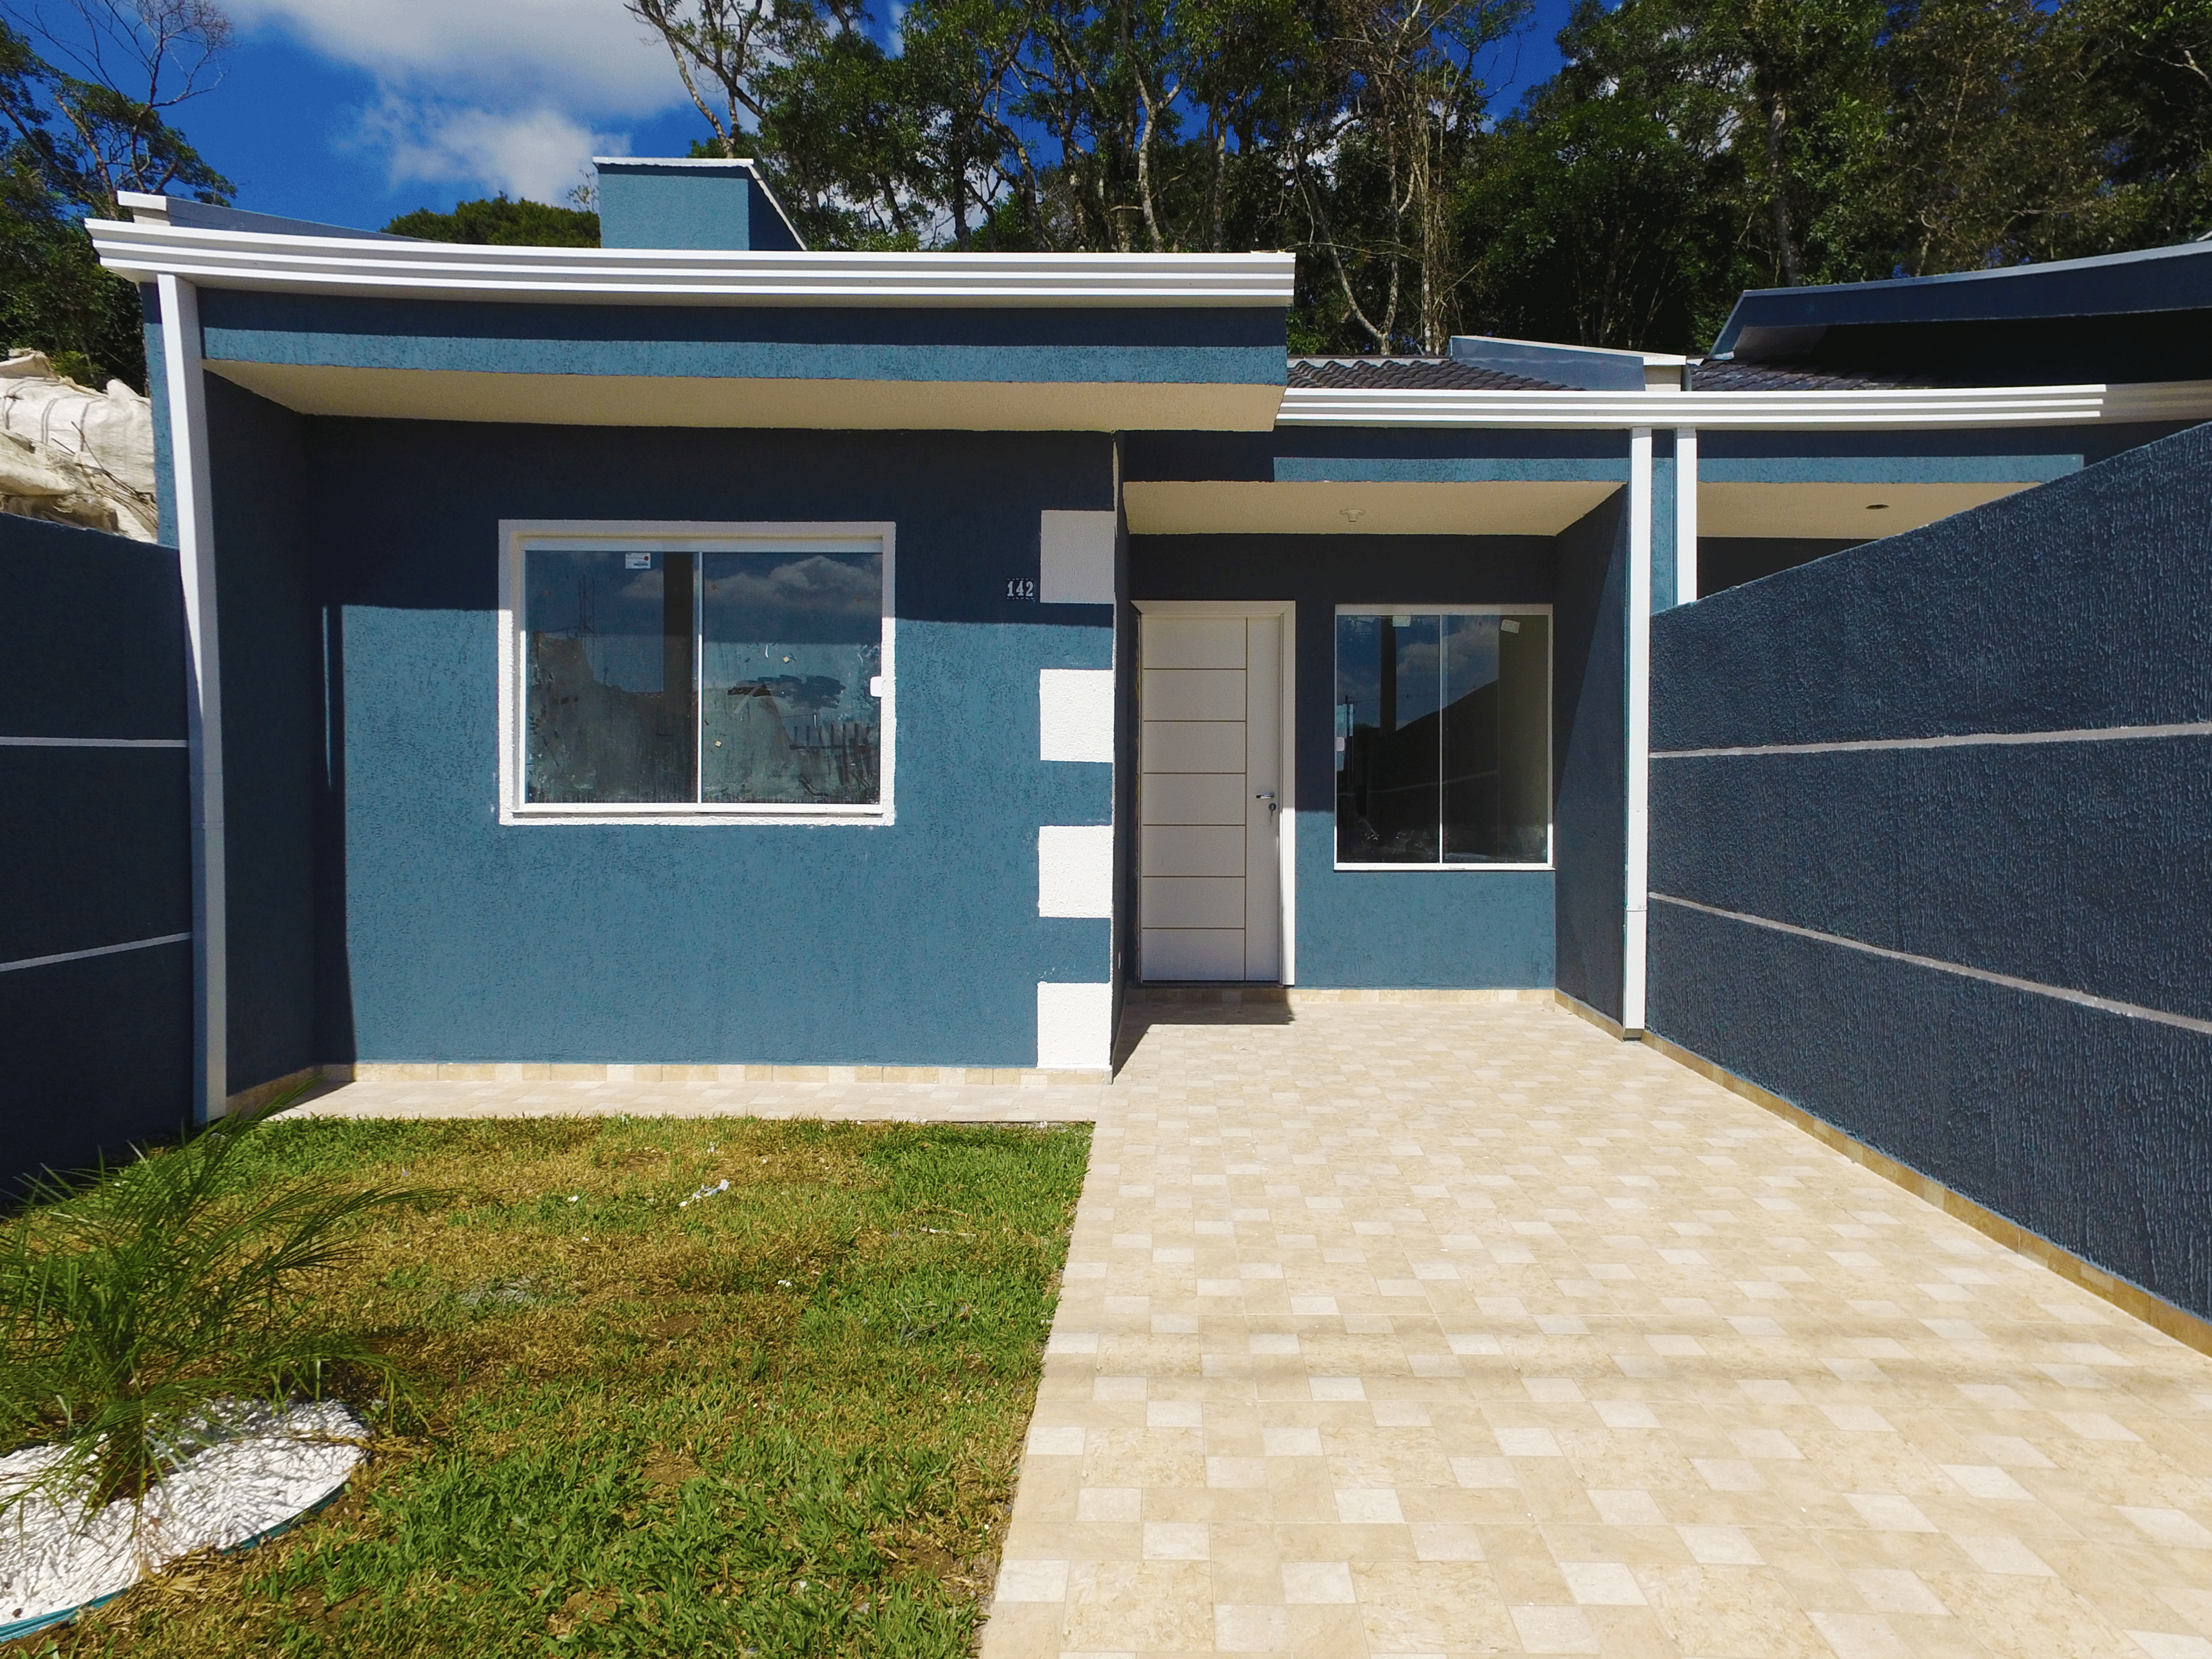 Bairro Green Field – 3 Dormitórios